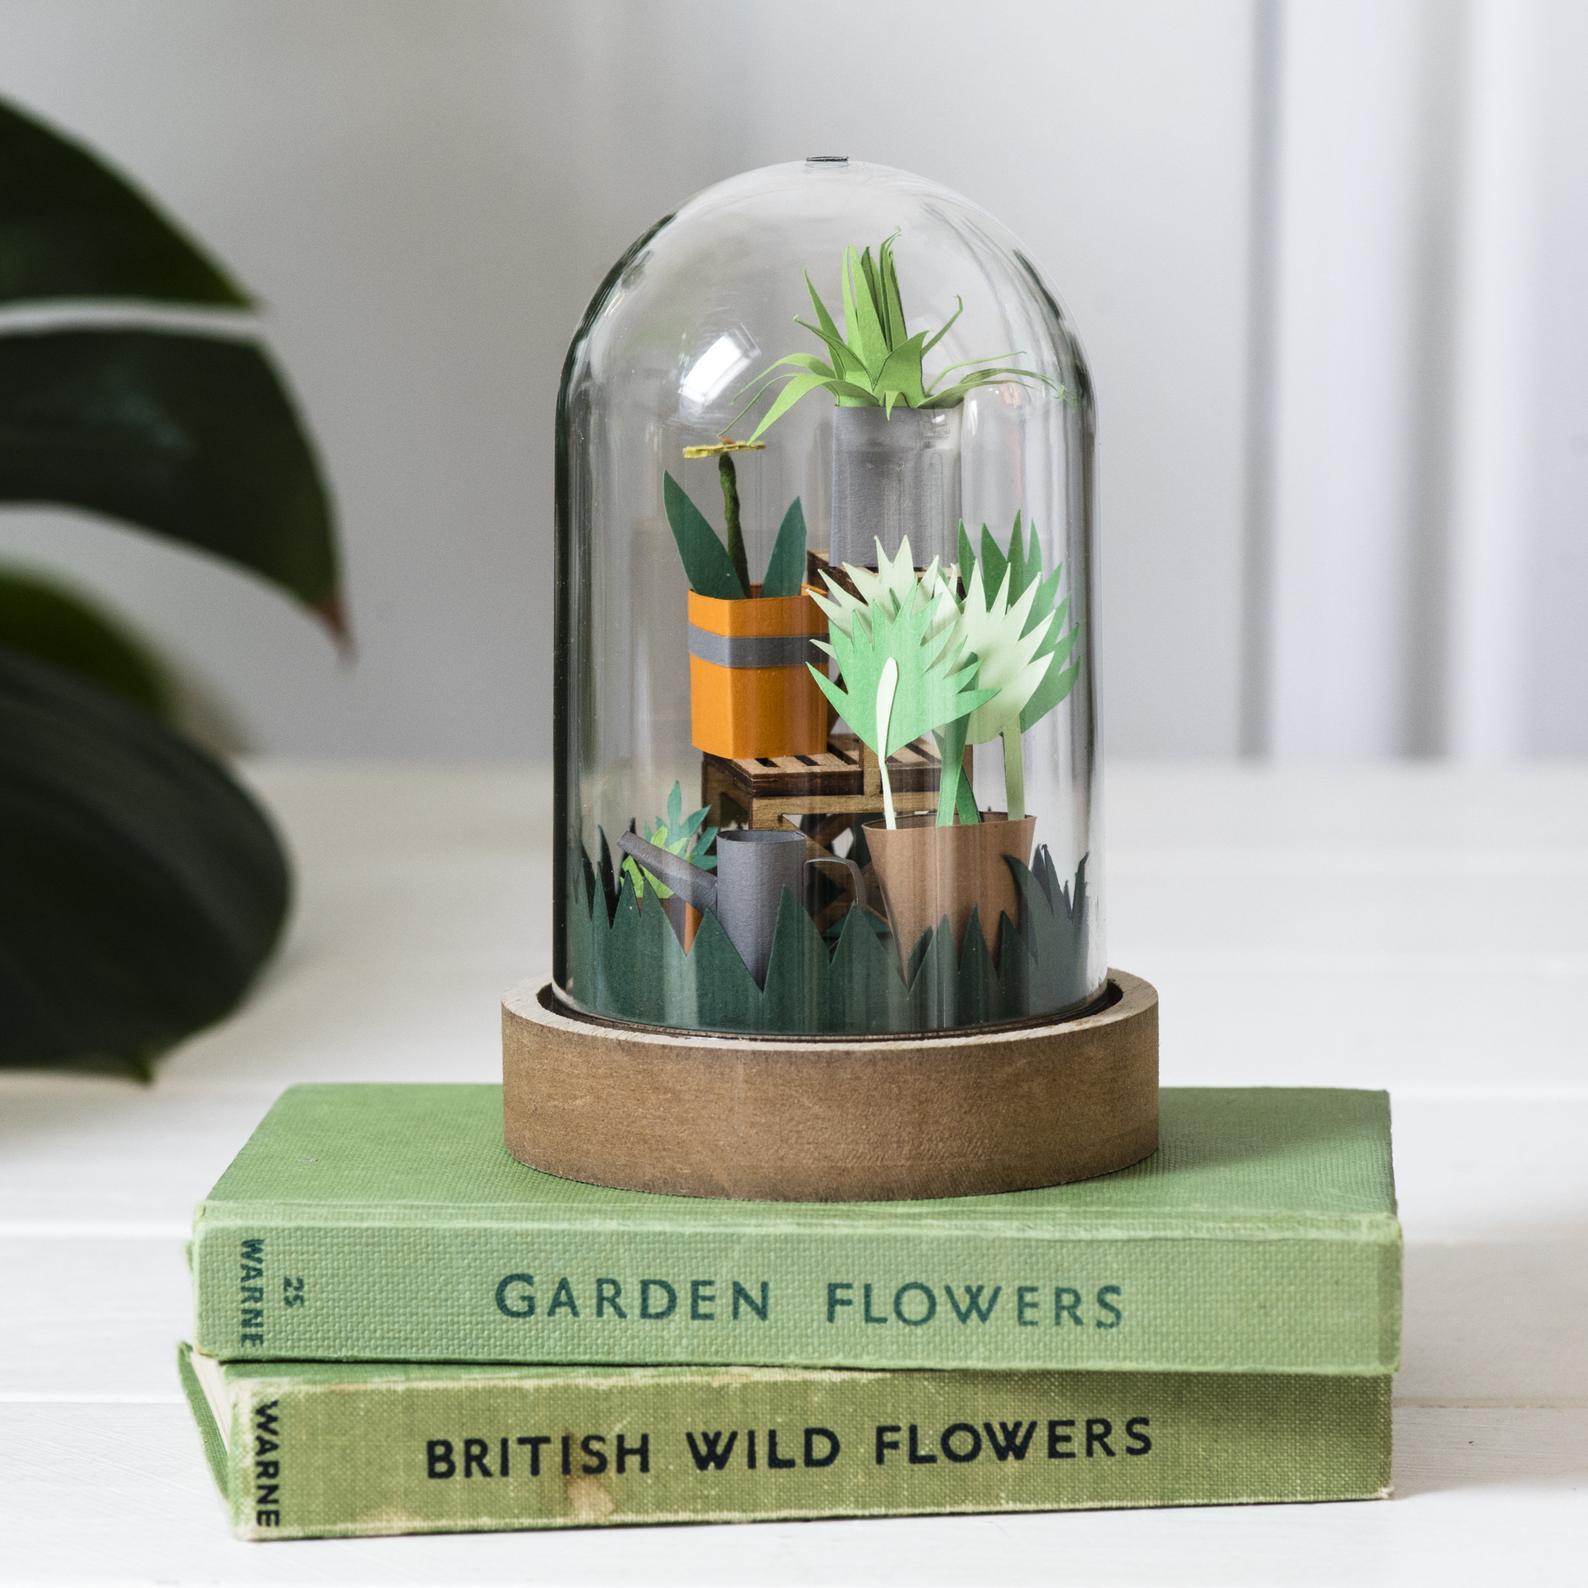 paper garden craft kits gift idea